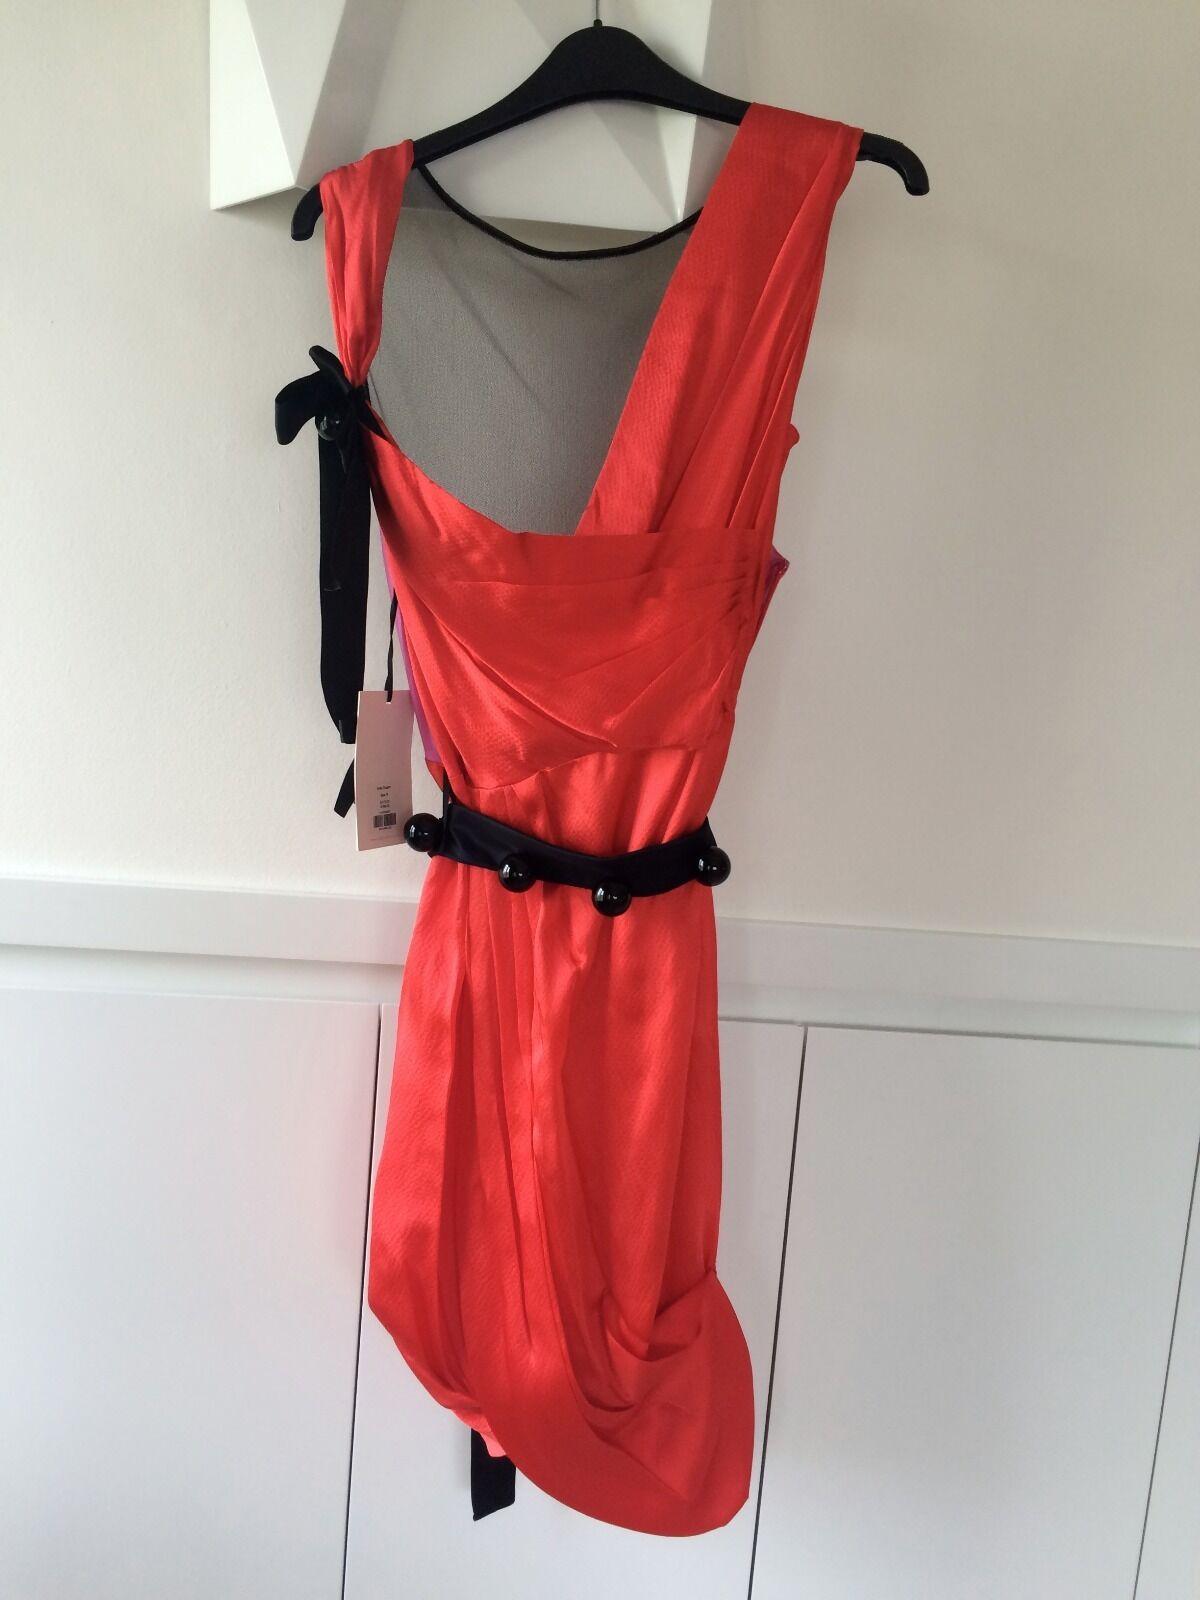 088aecea6f179 Roksanda Ilincic for Whistles Red Dress 8 UK Silk Size nqalxk1960 ...